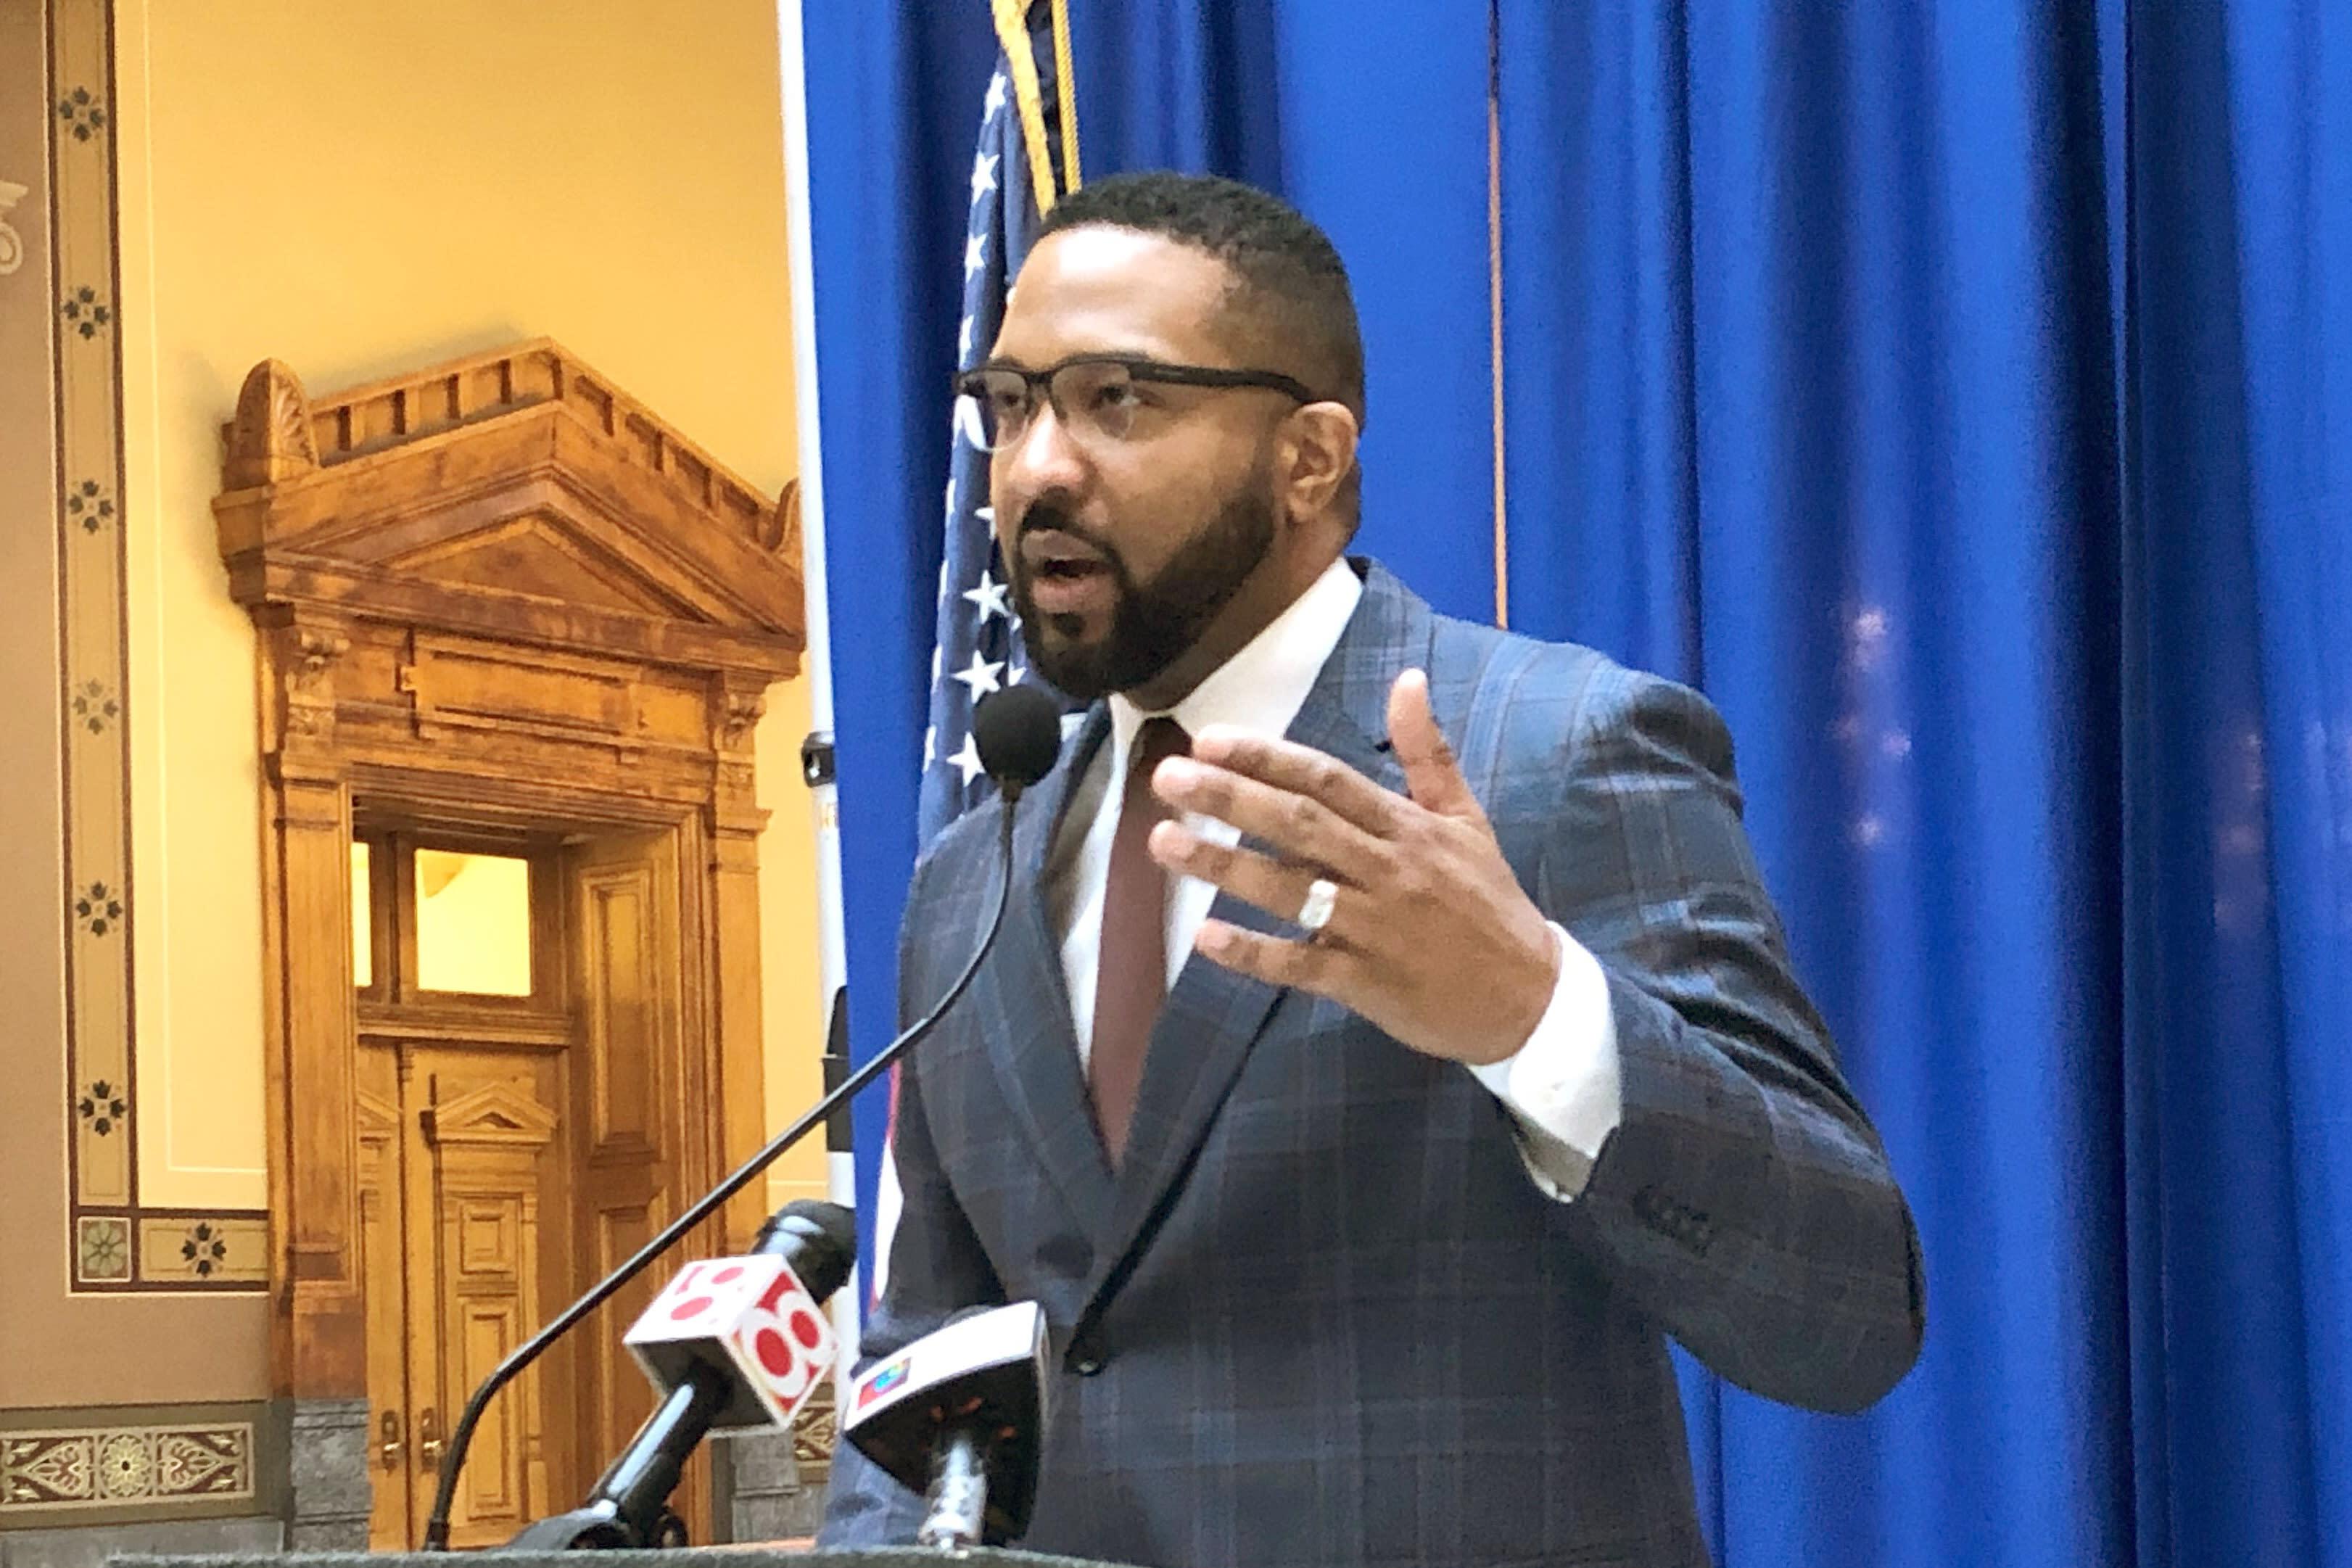 Black Legislator Confrontation